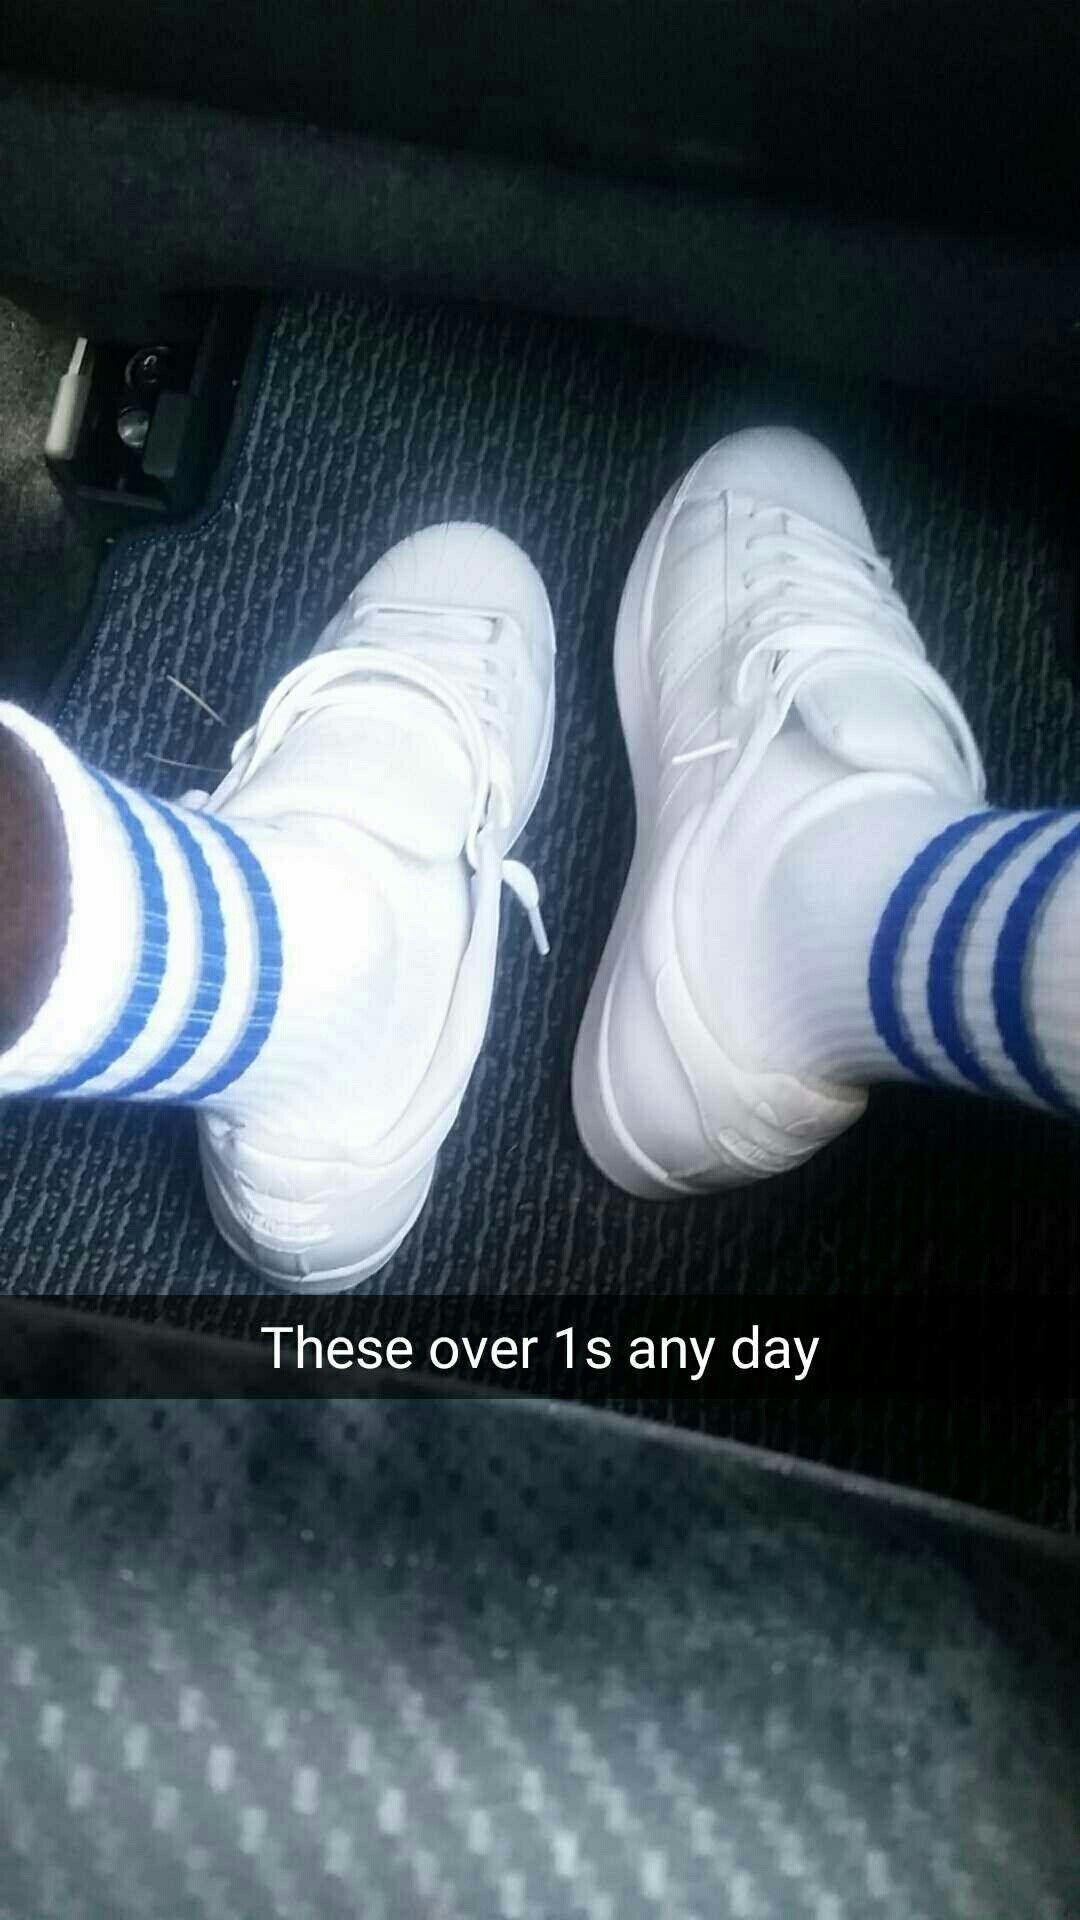 All white shell toe adidas